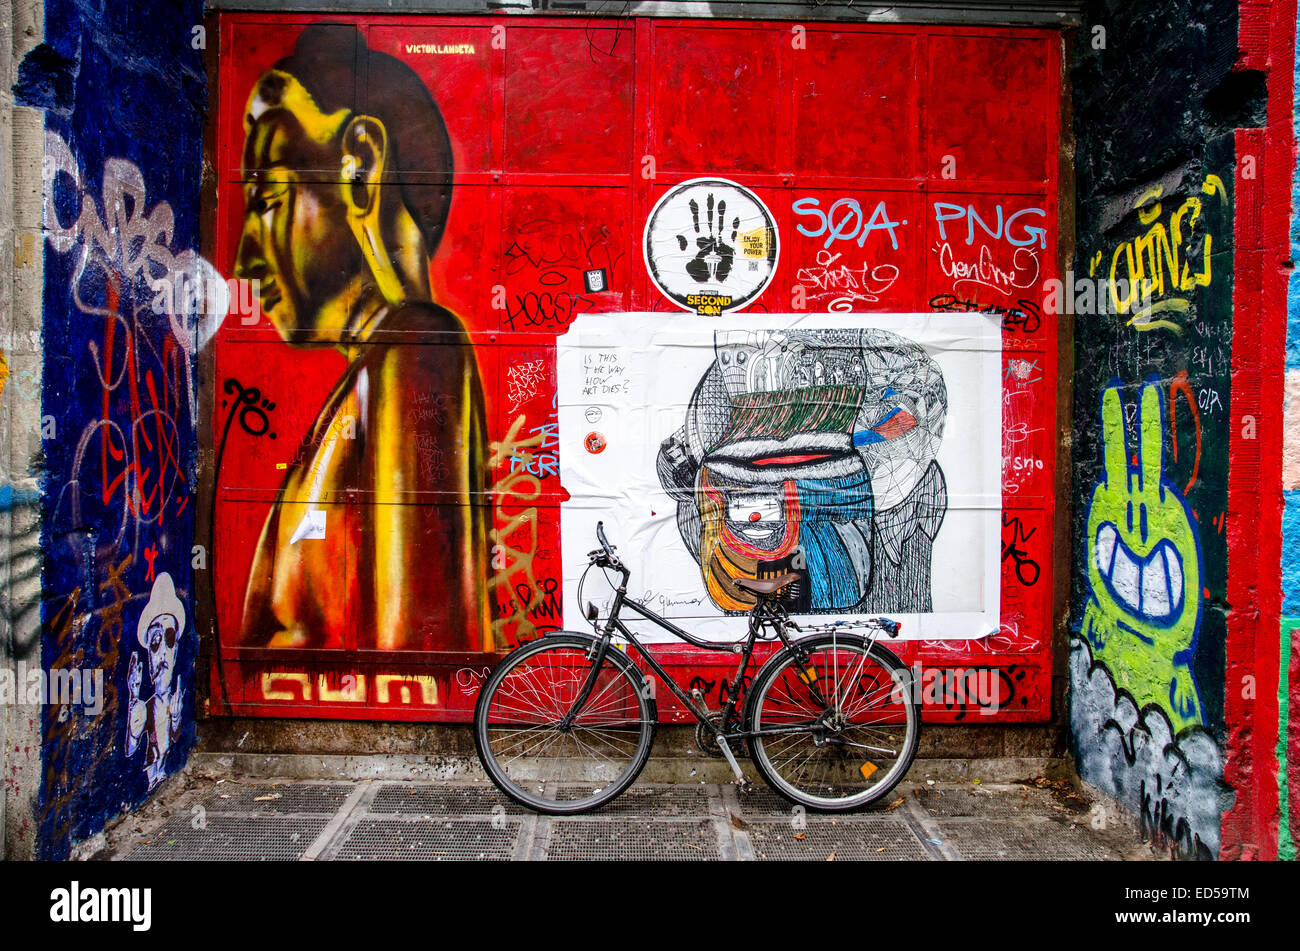 El muro de Berlín, East Side Gallery Imagen De Stock